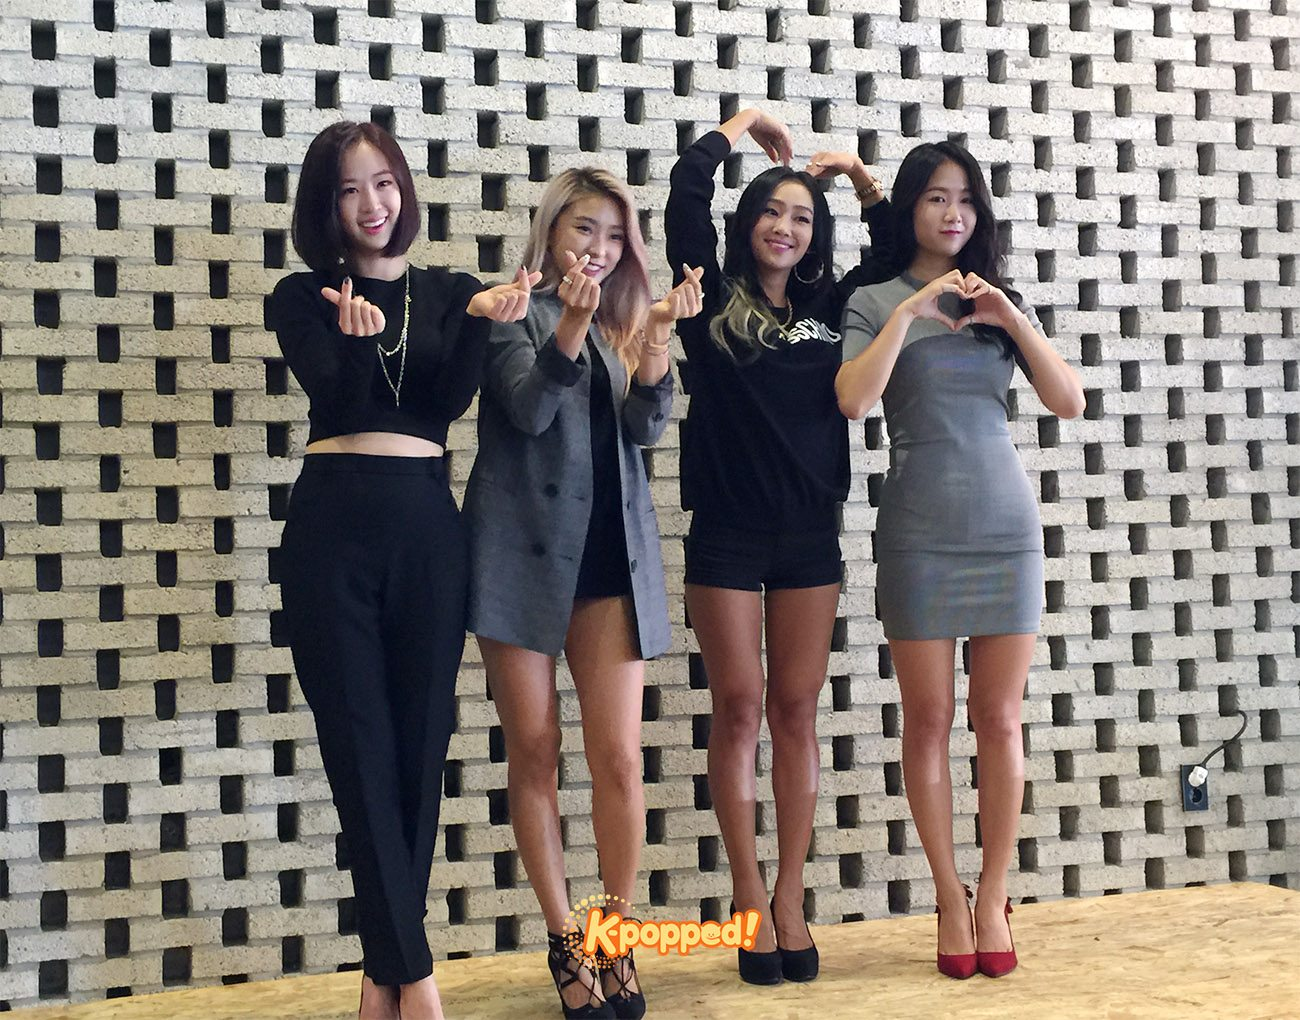 SISTAR Confirms Their Final Group Activities